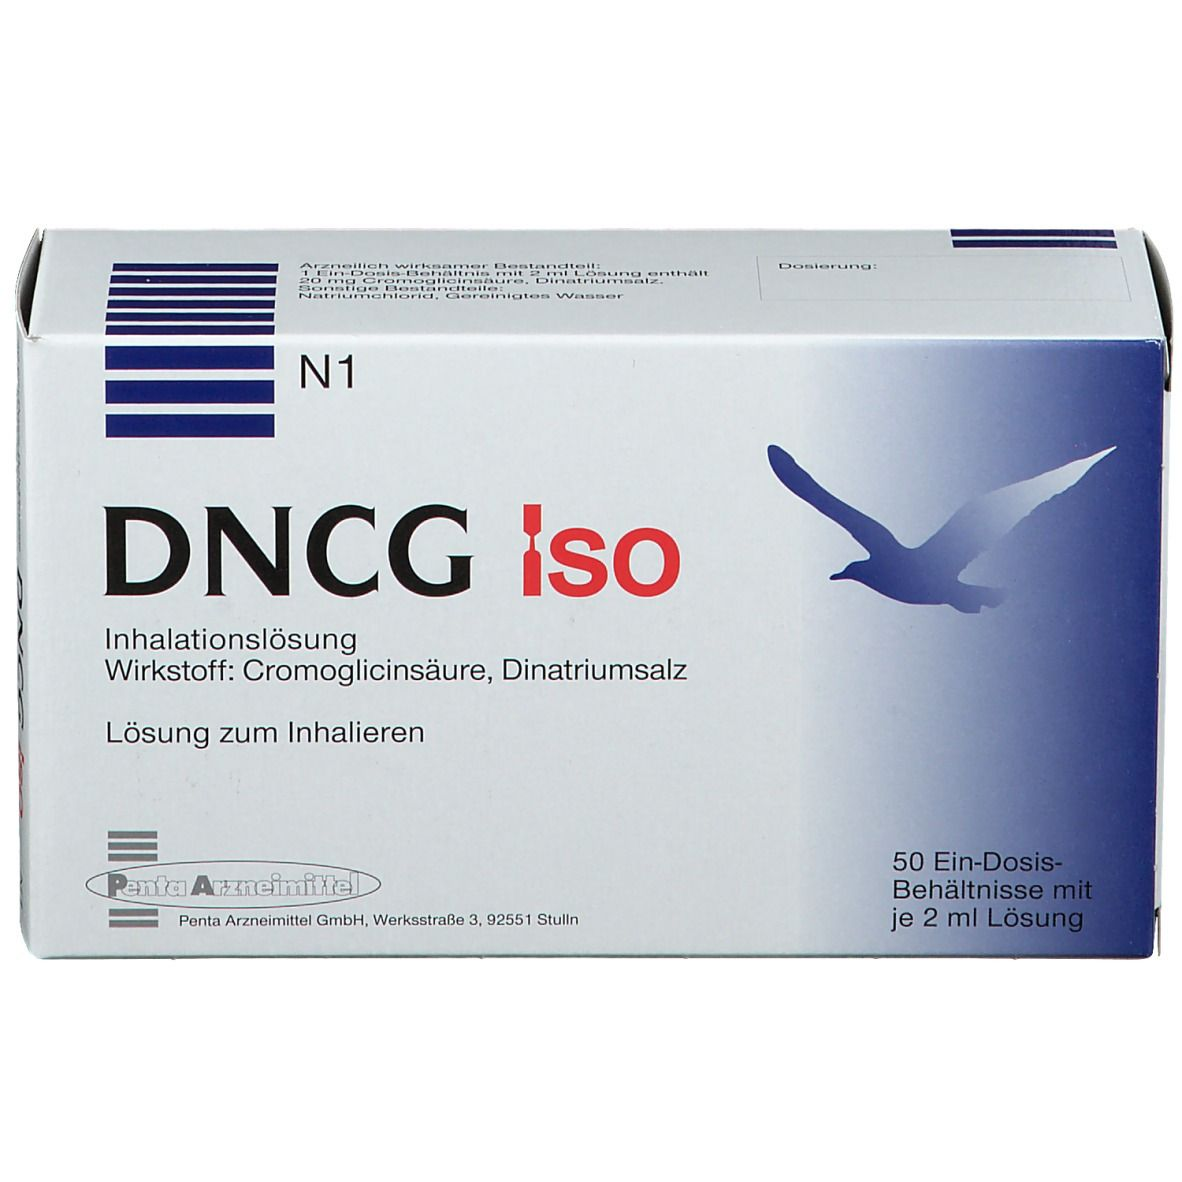 DNCG ISO Inhalationslösung